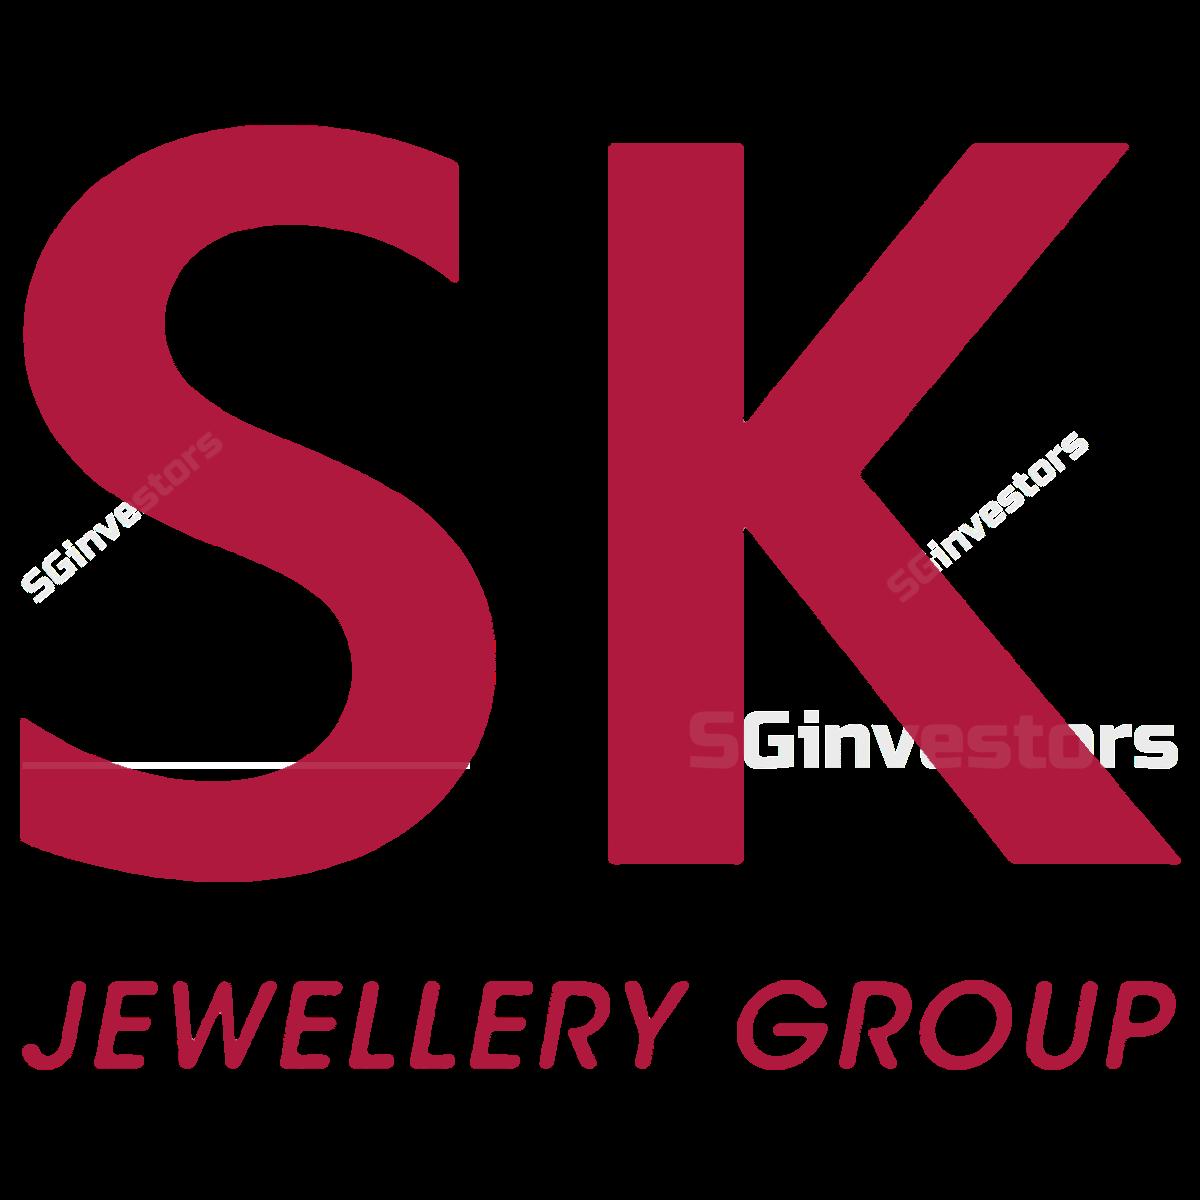 SK JEWELLERY GROUP LIMITED (SGX:42G) @ SGinvestors.io